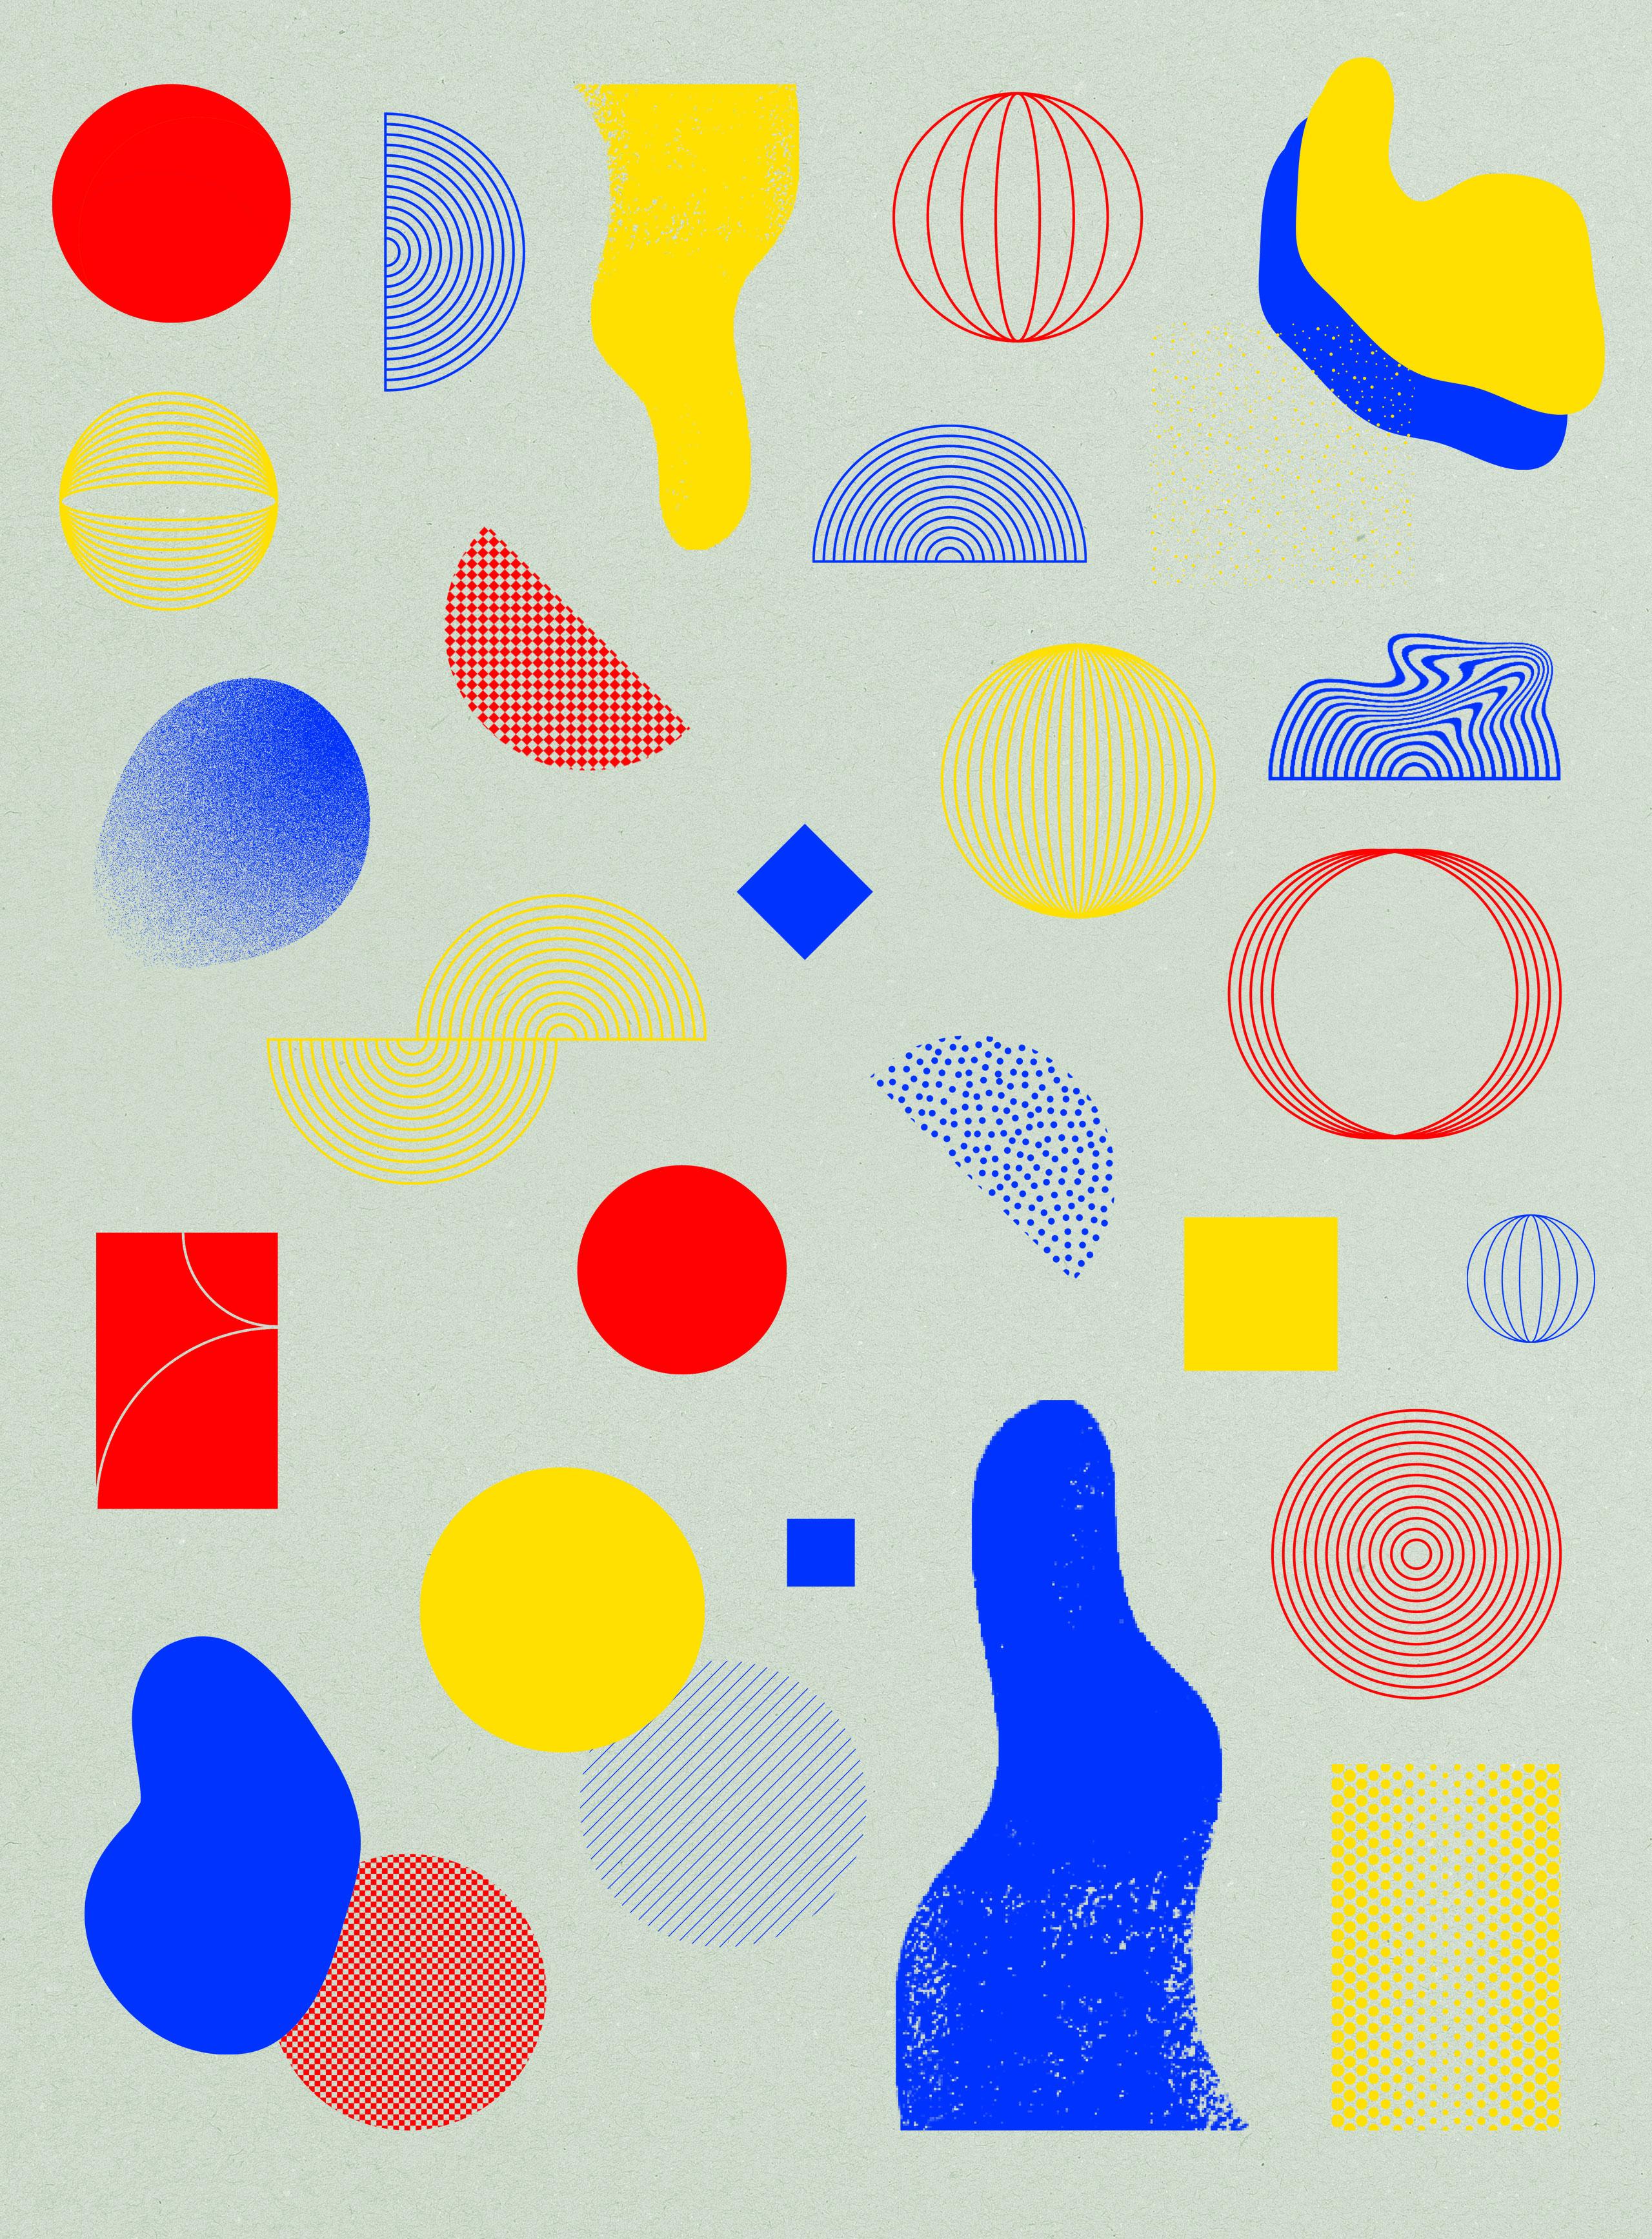 JuliaSchwarzIllustration_AnaOtt_pattern